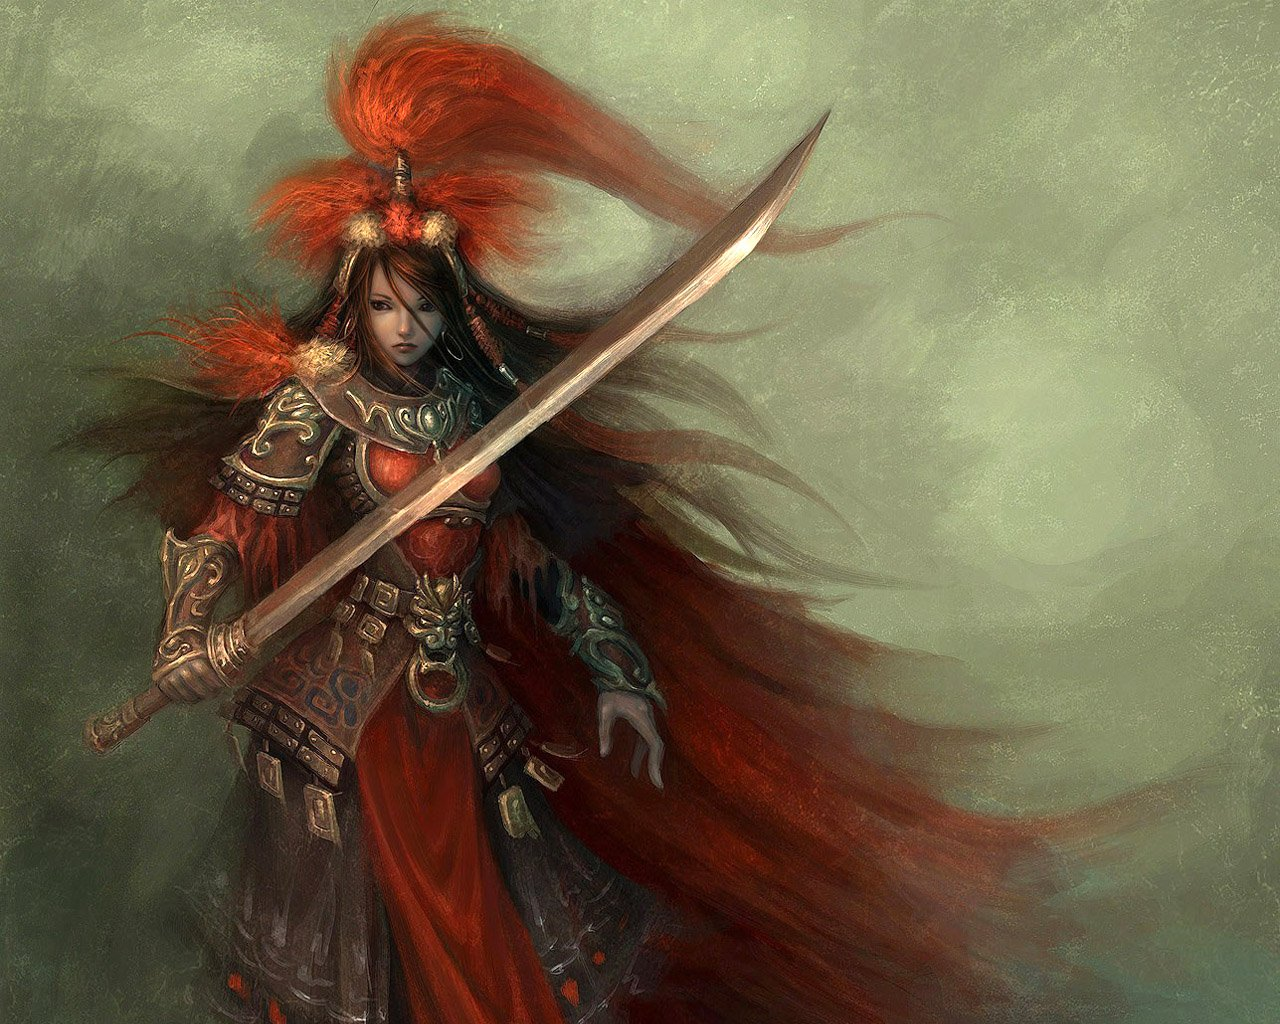 Samurai Female Warrior Wallpapers Metal Fantasy Heavy Metal 1280x1024